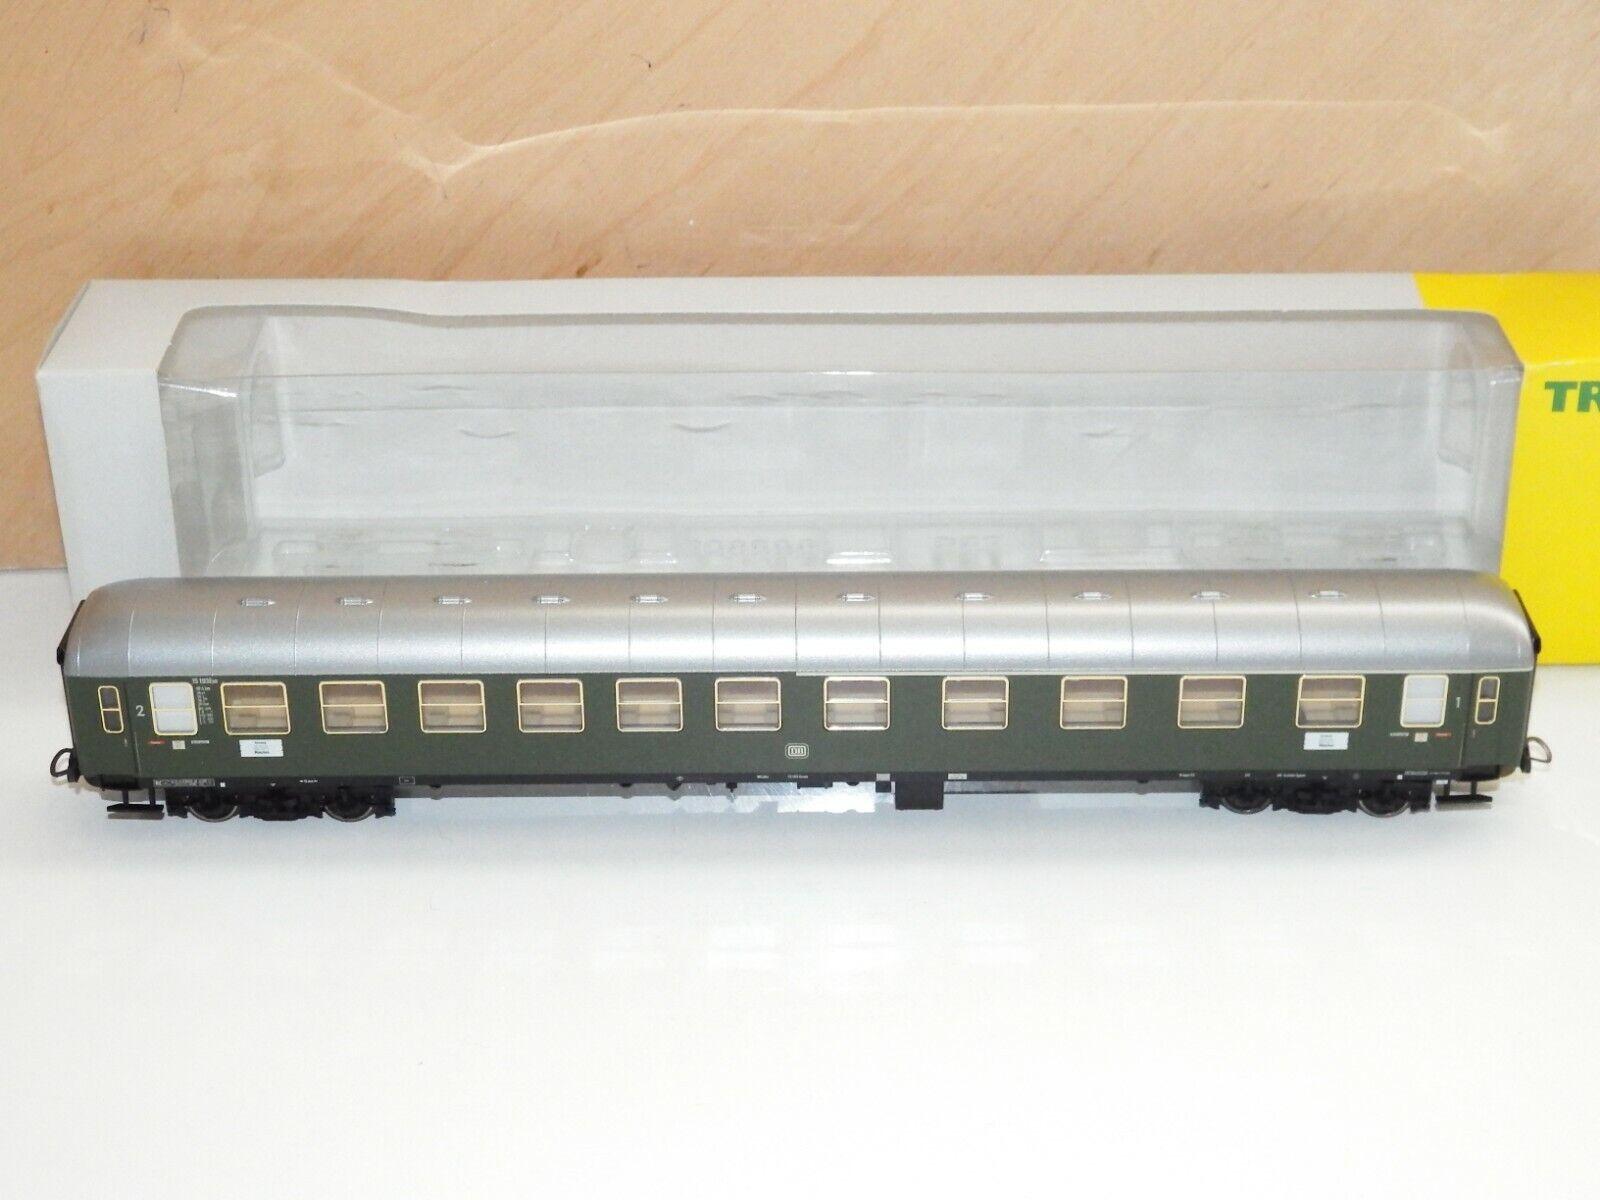 H0 Trix 23402 Passenger Car 1 2. Class The DB MINT BOXED 3385